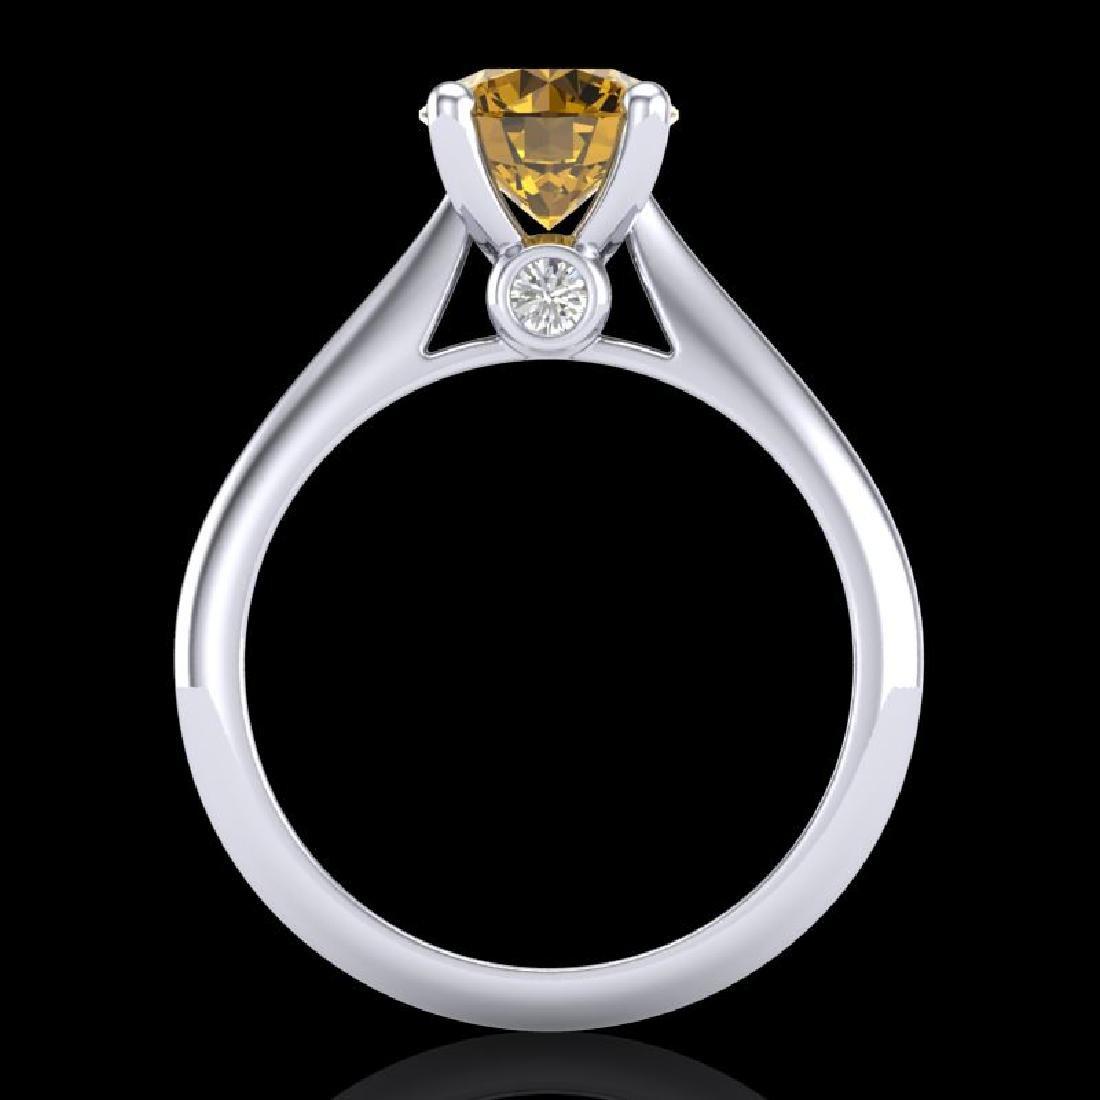 1.6 CTW Intense Fancy Yellow Diamond Engagement Art - 3